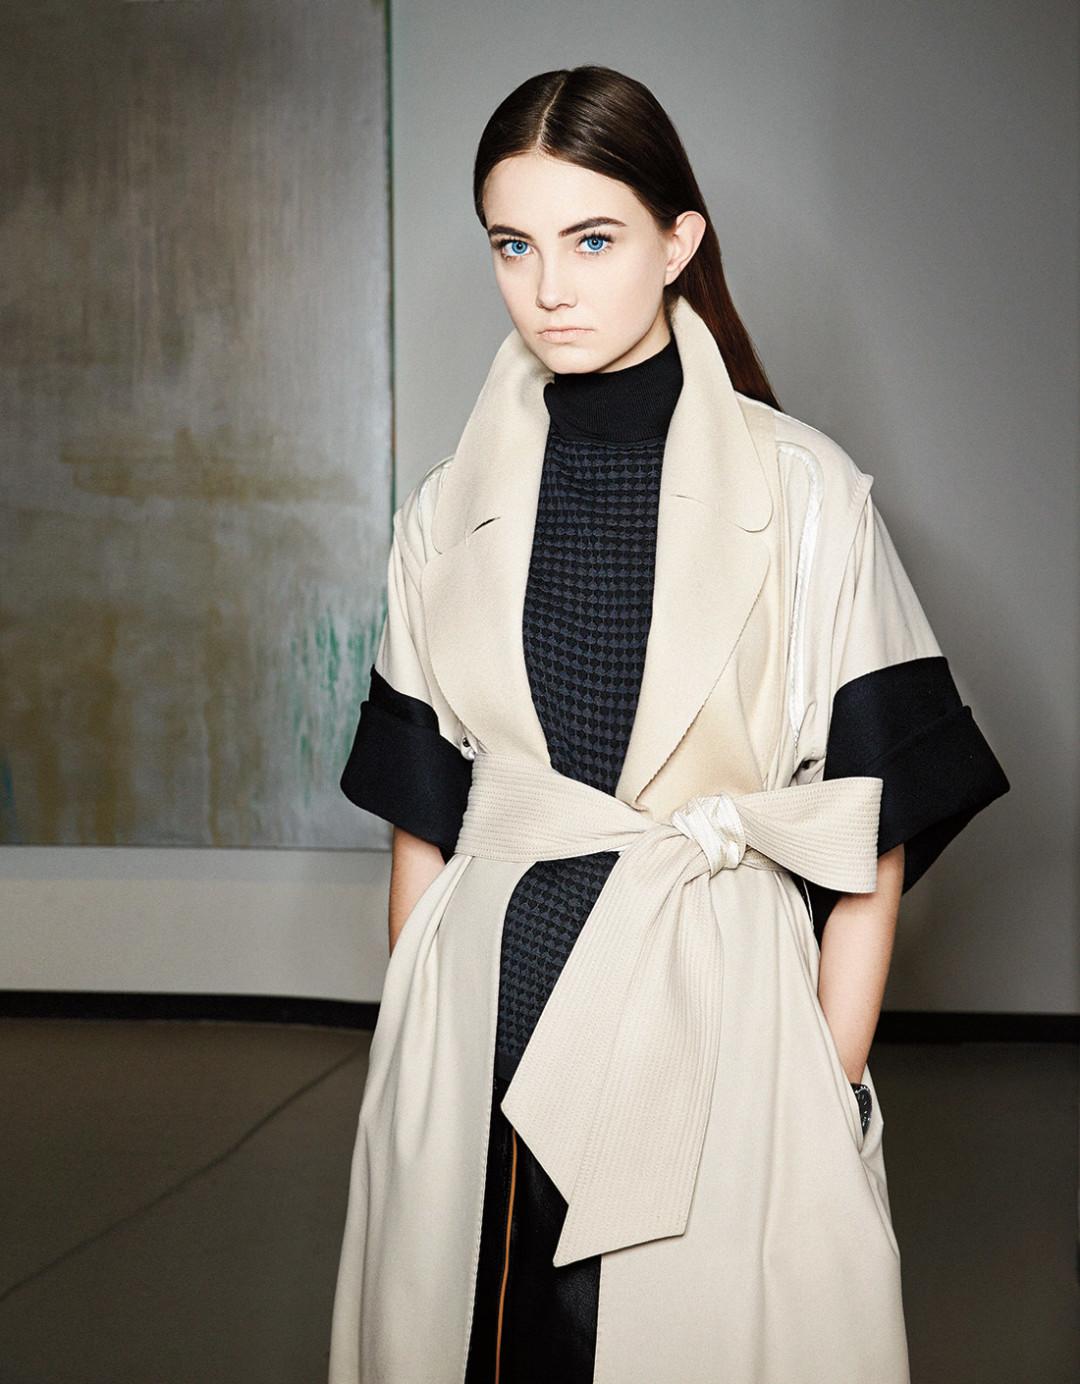 0215 plain spoken cream black jacket an2vsa